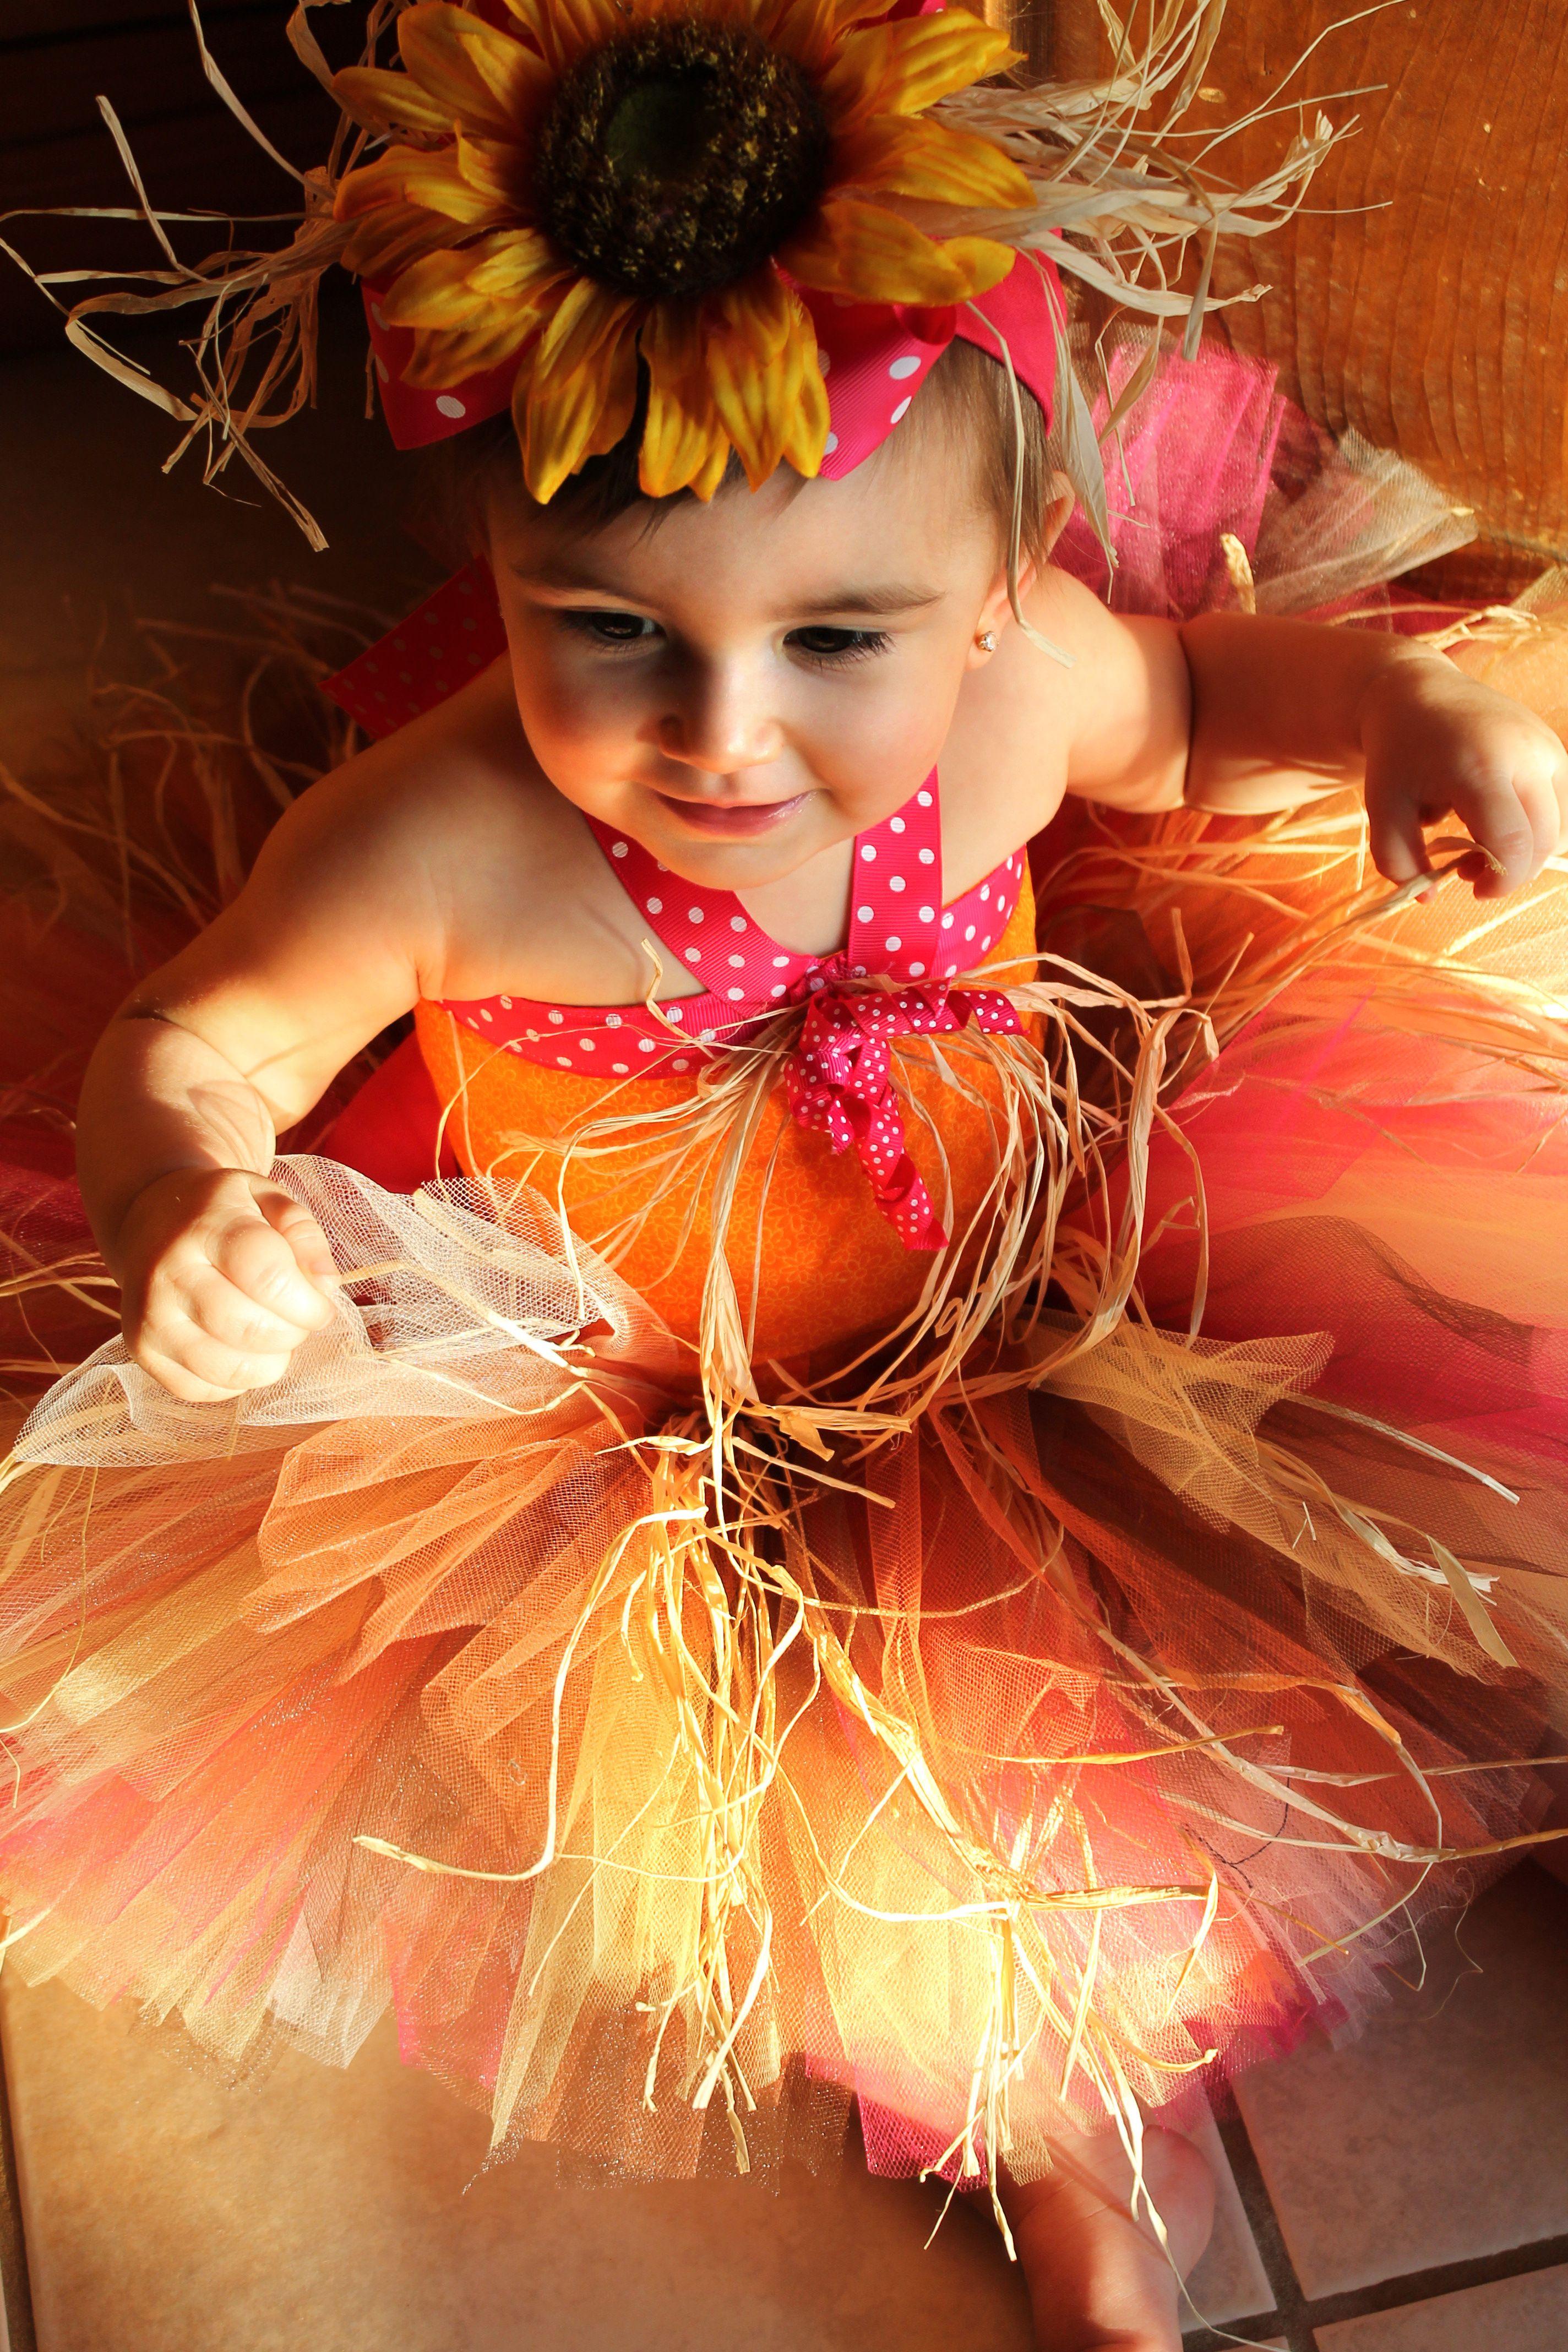 Top view. Baby portrait. Fall. Sunflower tutu.